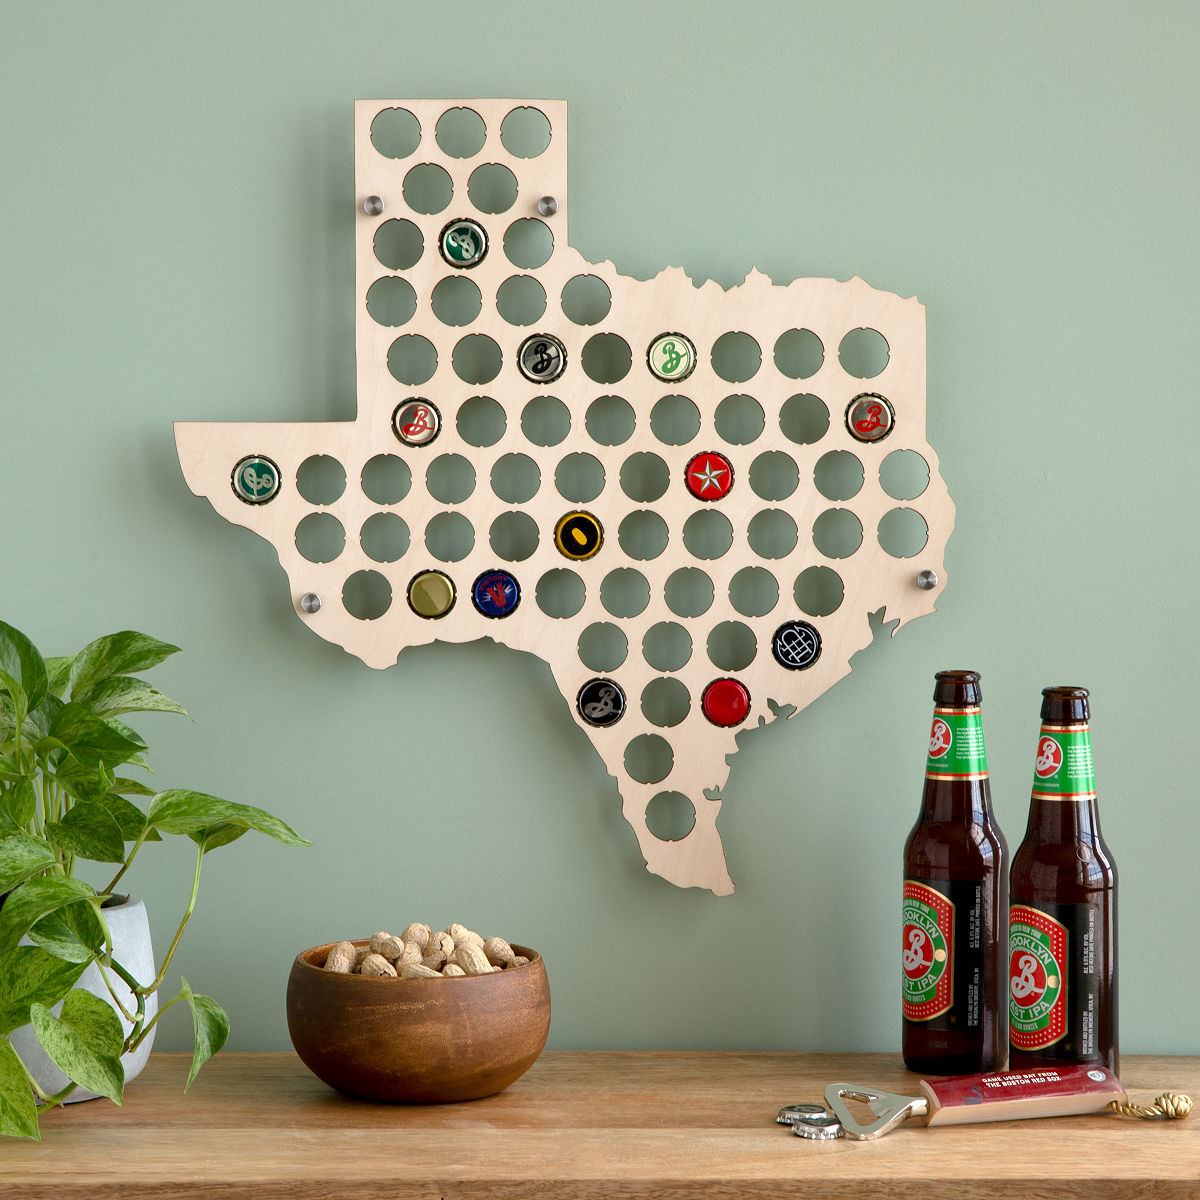 Beer Cap States Bottle Caps UncommonGoods US Beer Cap Map Small